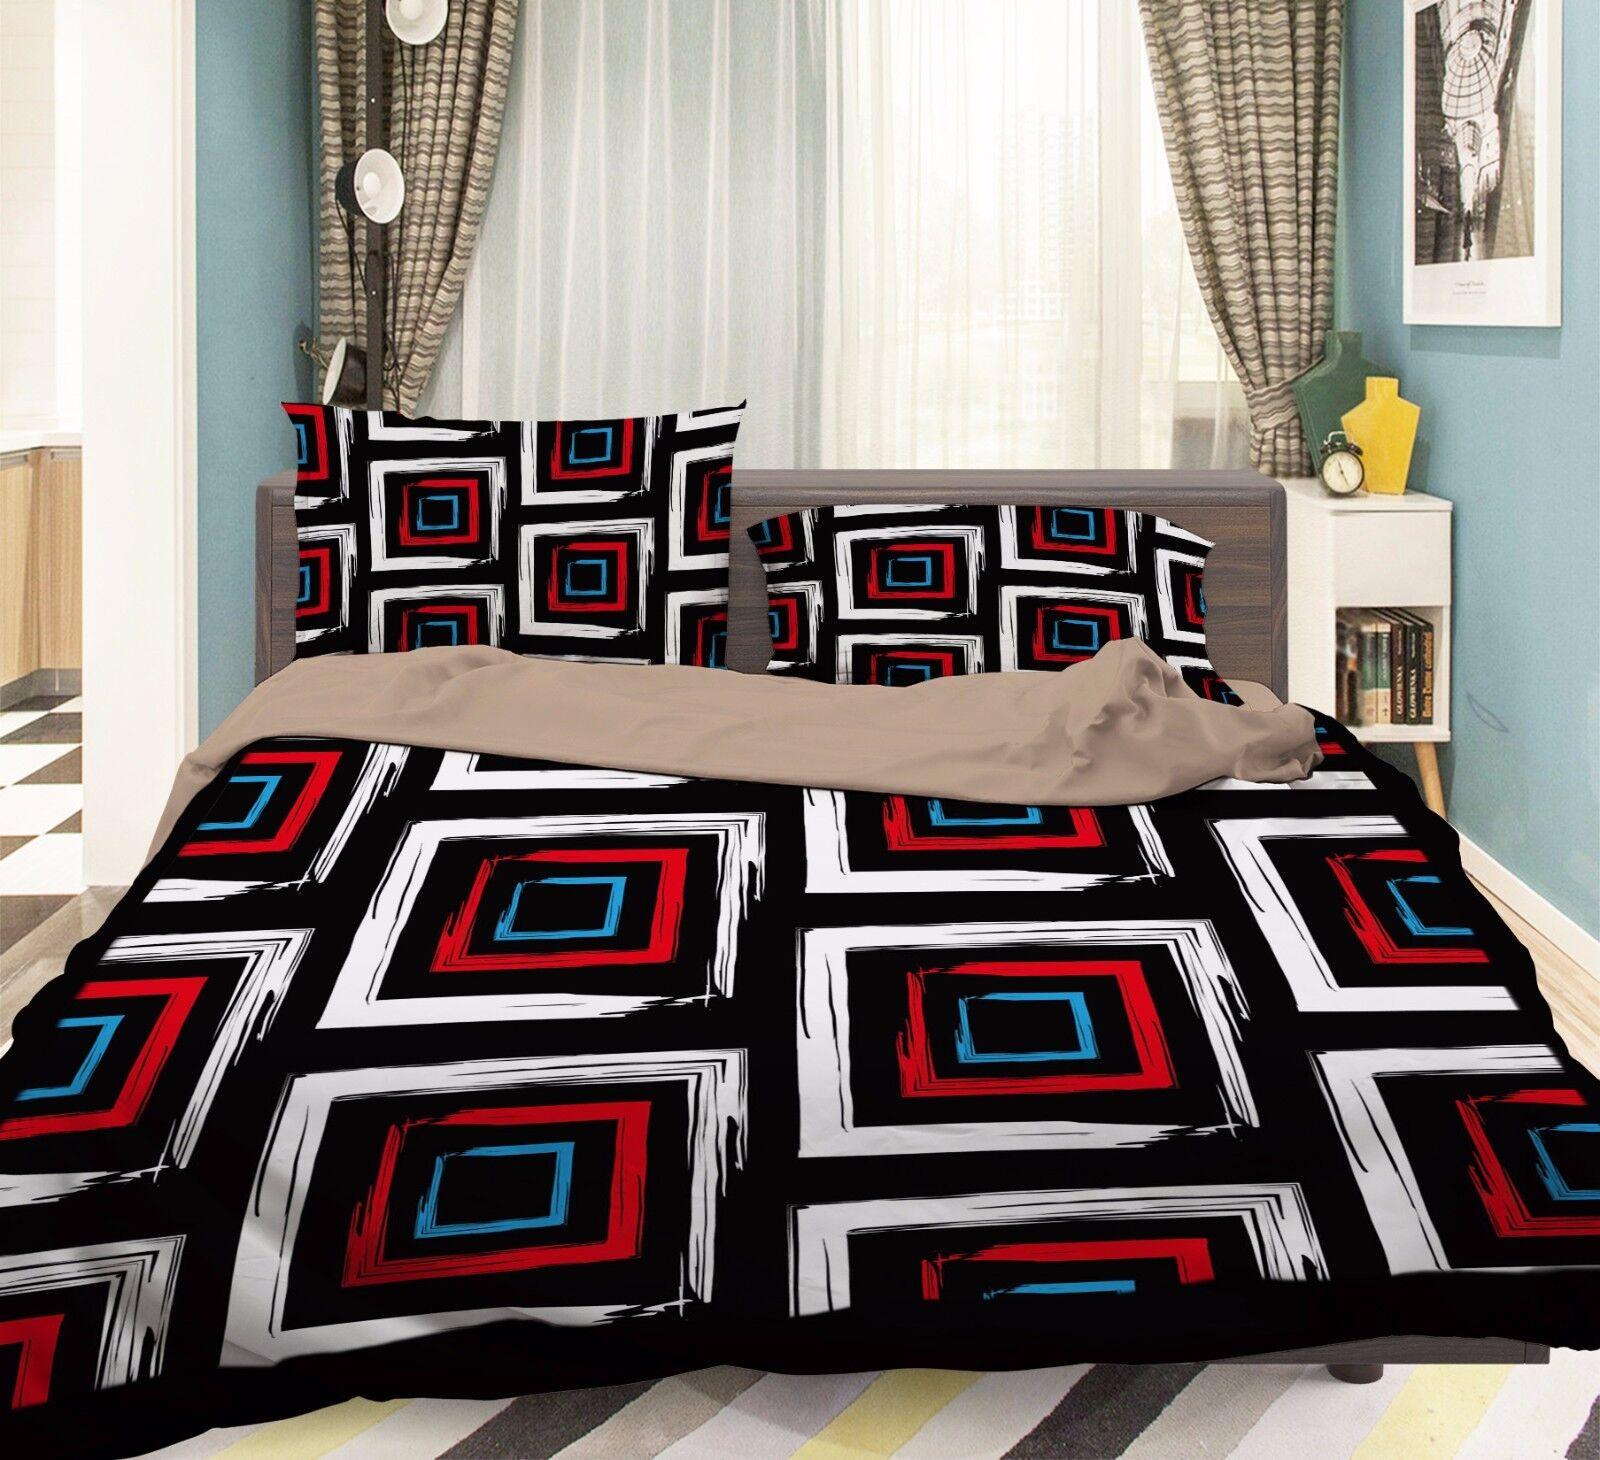 3D Grid Painted 906 Bed Pillowcases Quilt Duvet Cover Set Single Queen UK Summer